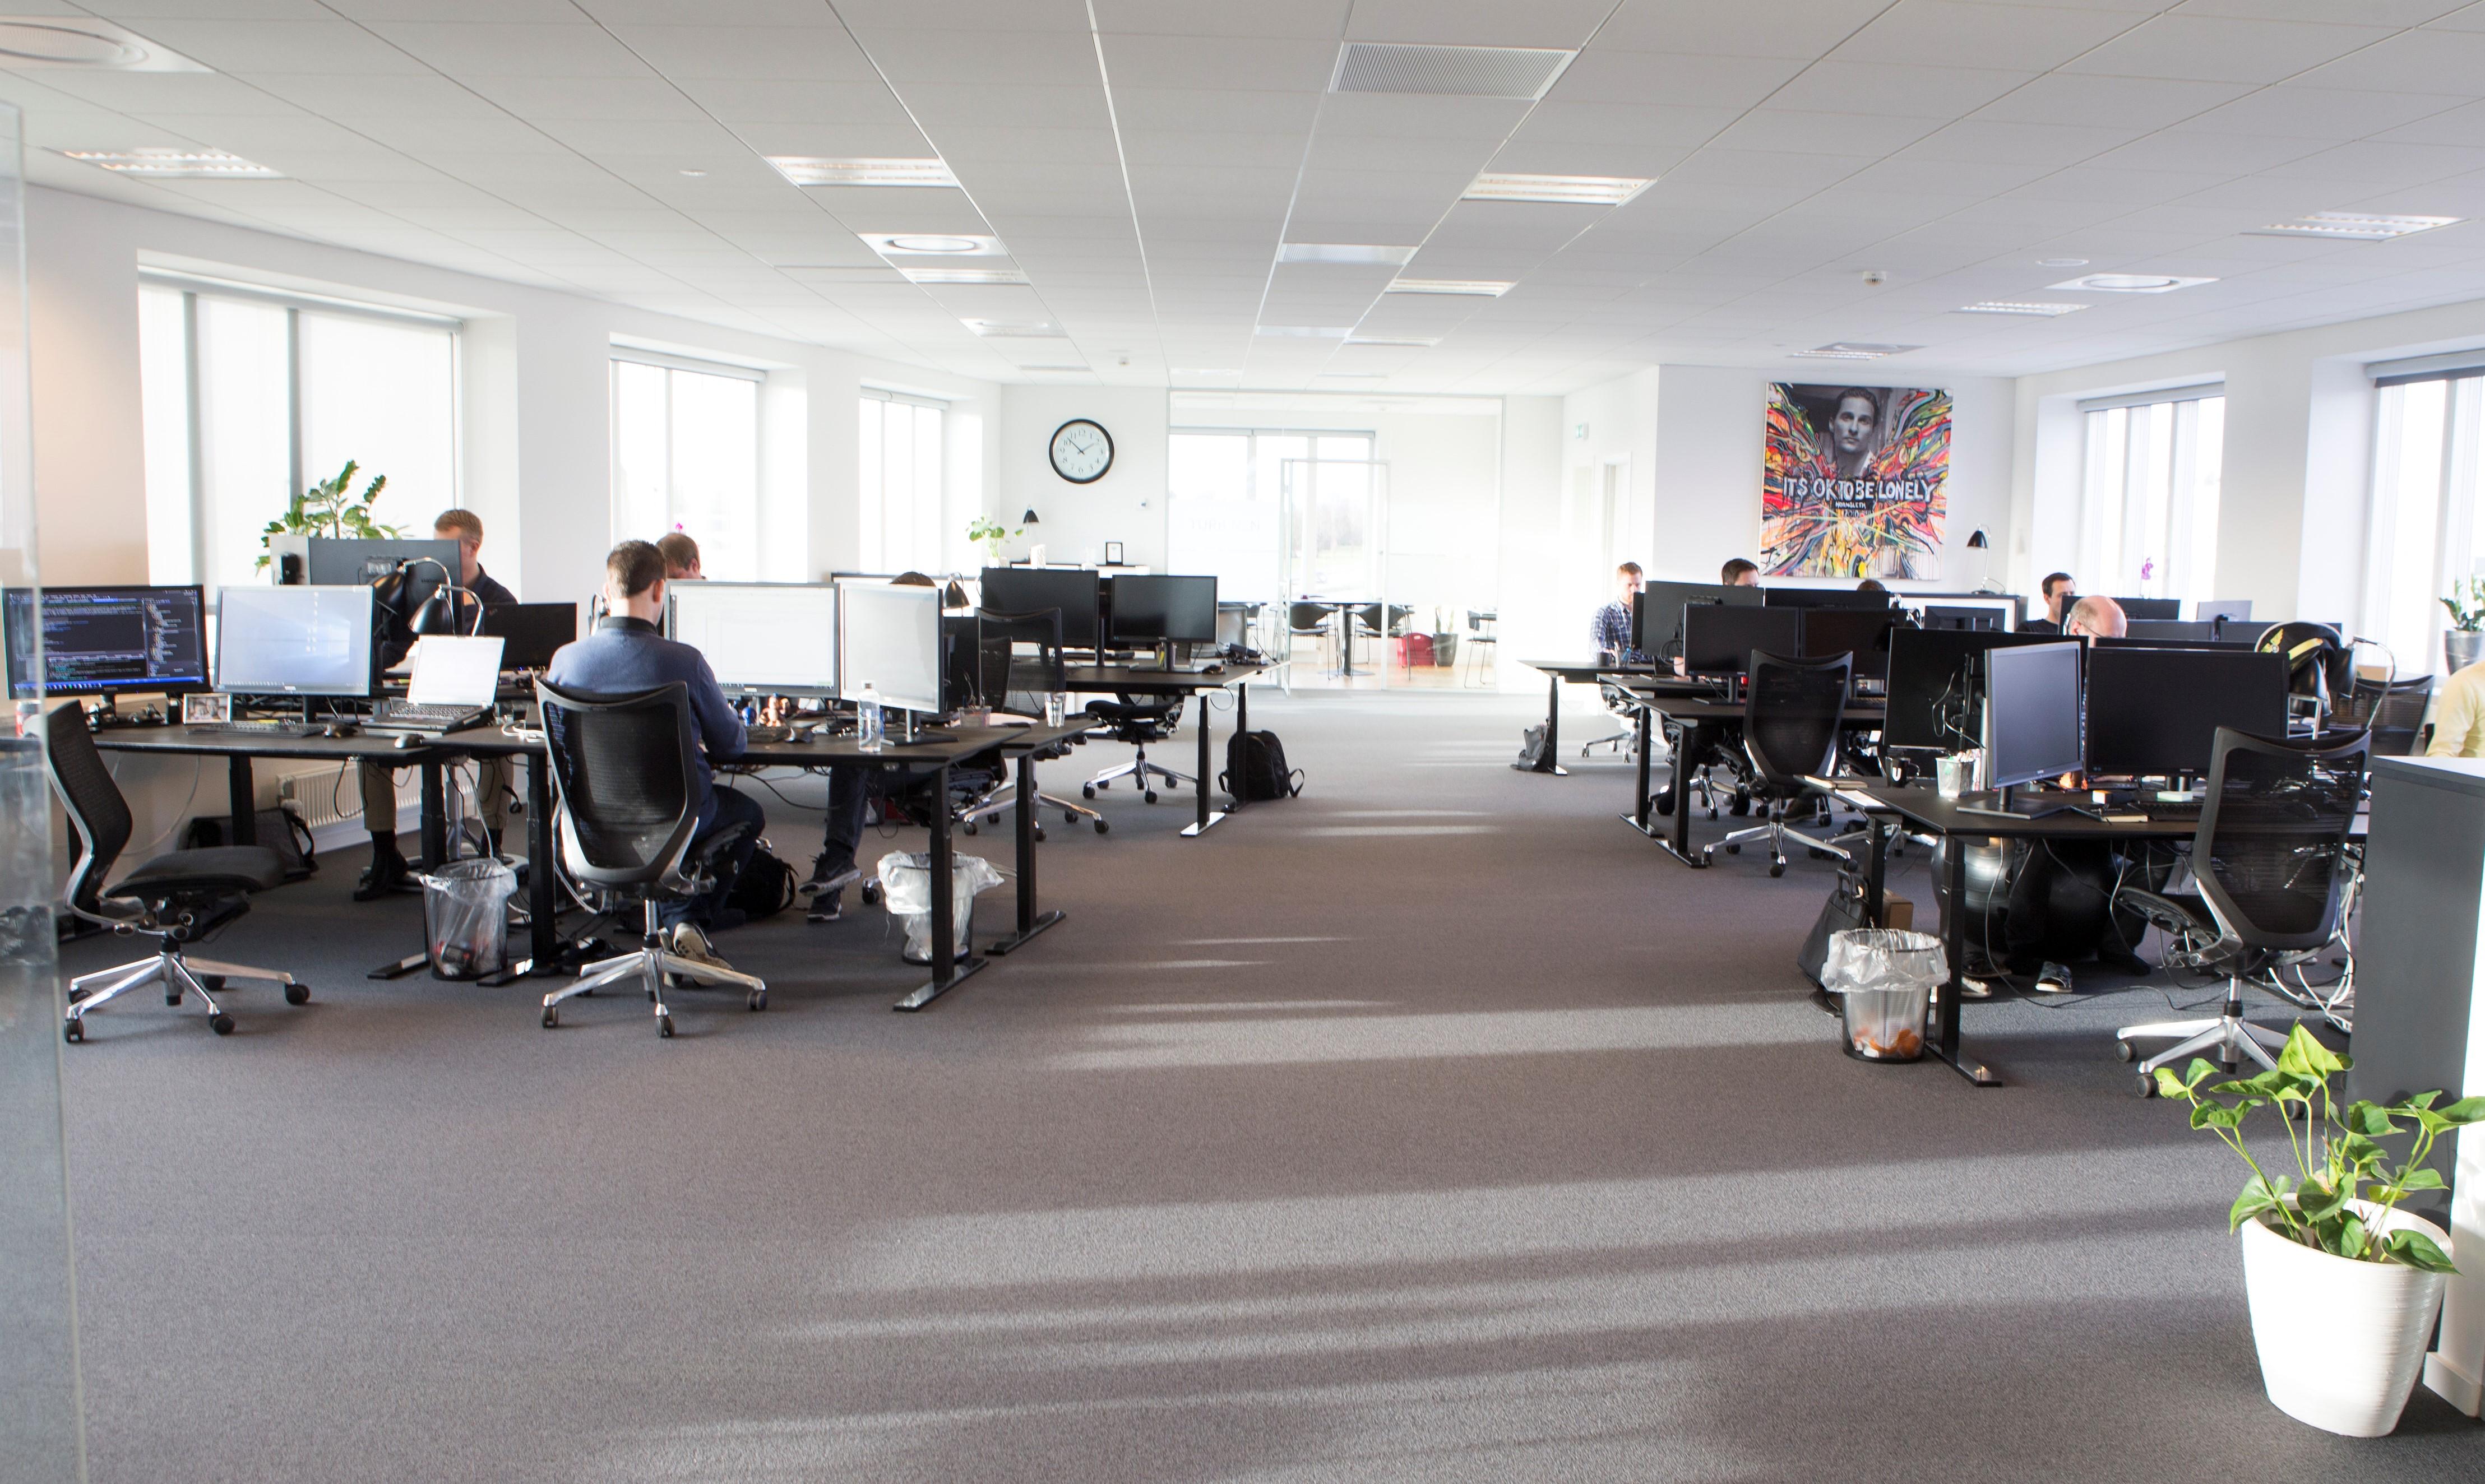 Half-empty Kraftvaerk Office in Copenhagen during the covid-19 pandemic